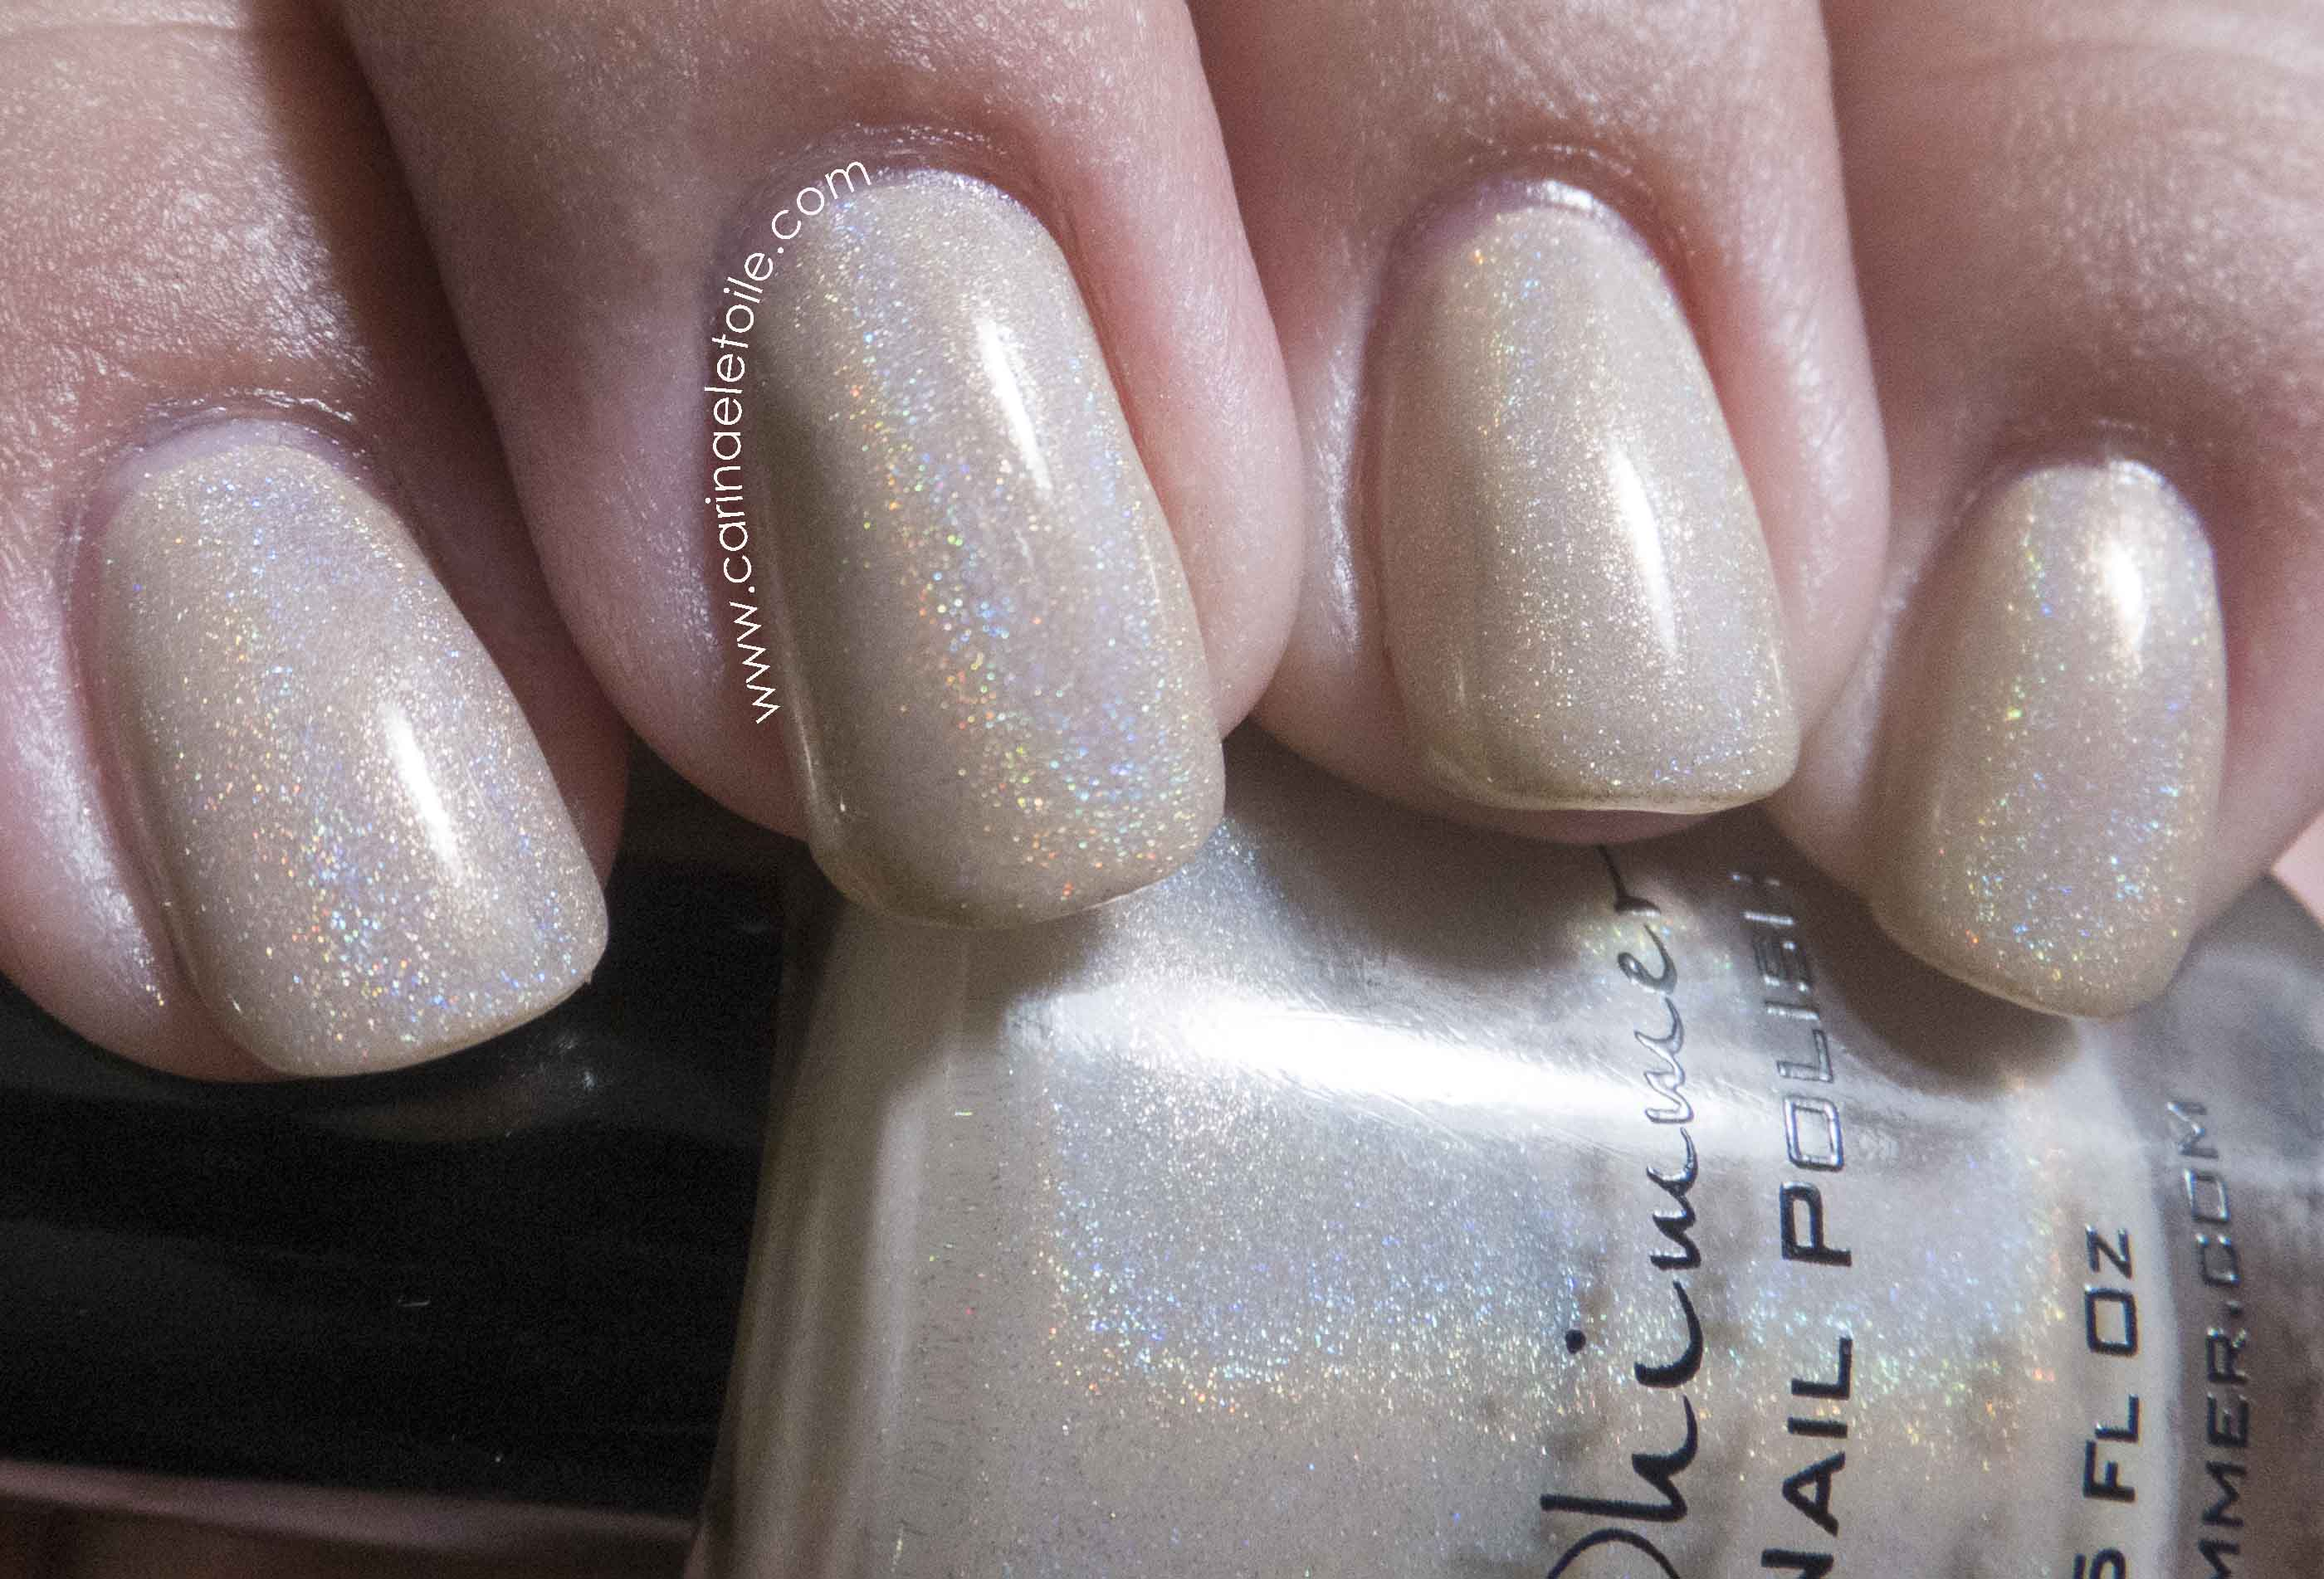 KB Shimmer In Bare Form | Carinae L\'etoile\'s polish stash